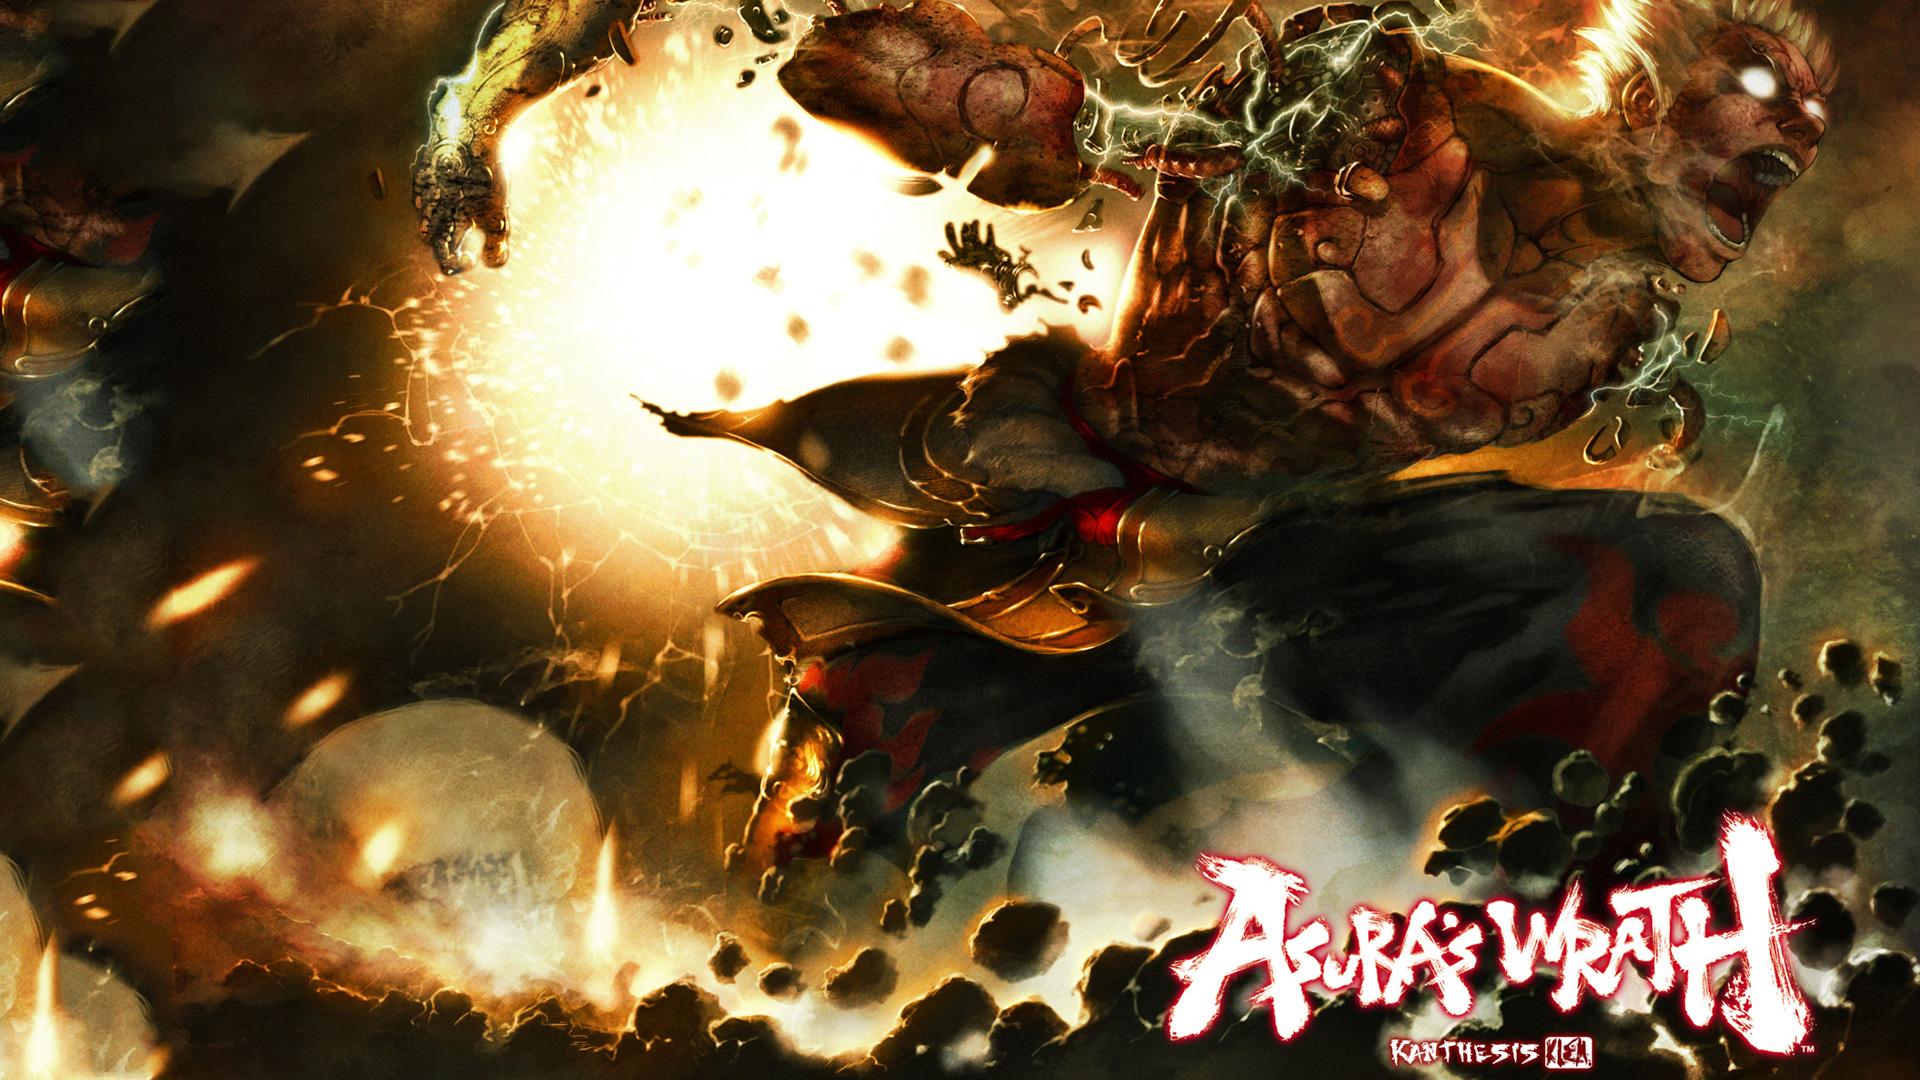 Asuras Wrath HD Wallpaper Background Image 1920x1080 ID 1920x1080